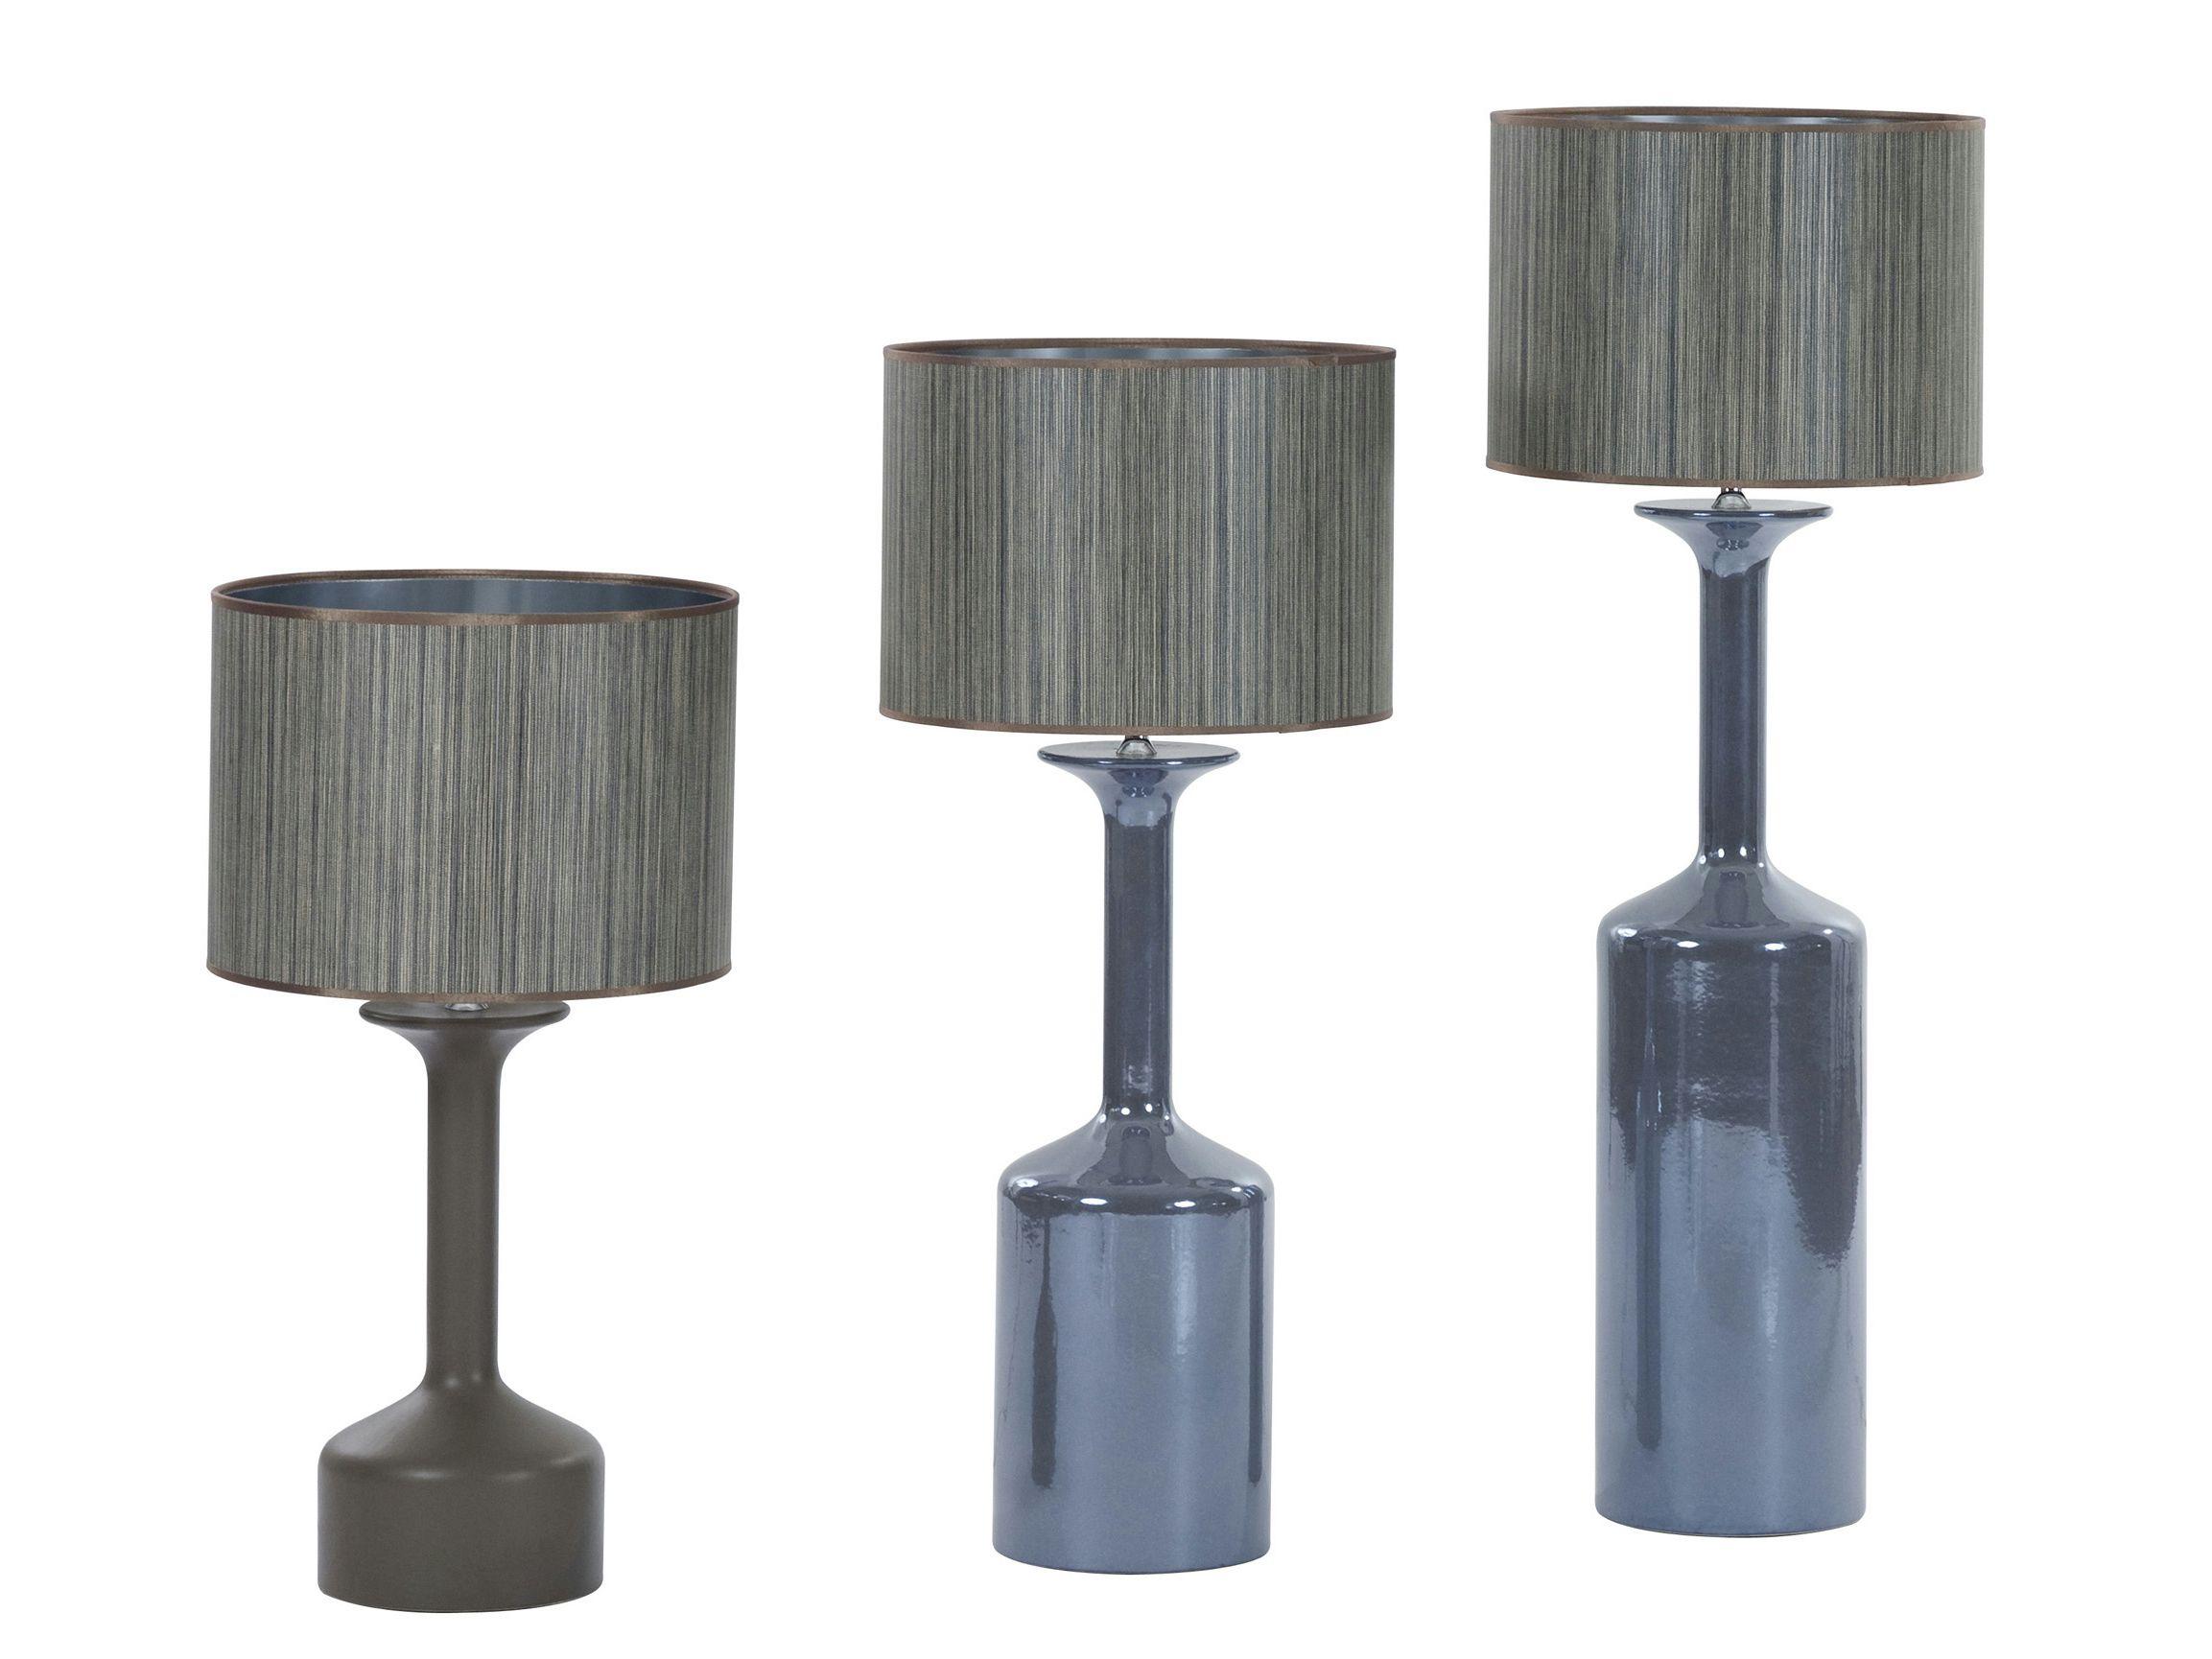 Ceramic Table Lamp ANDY By ROCHE BOBOIS Design Pierre Dubois Aim C Cil